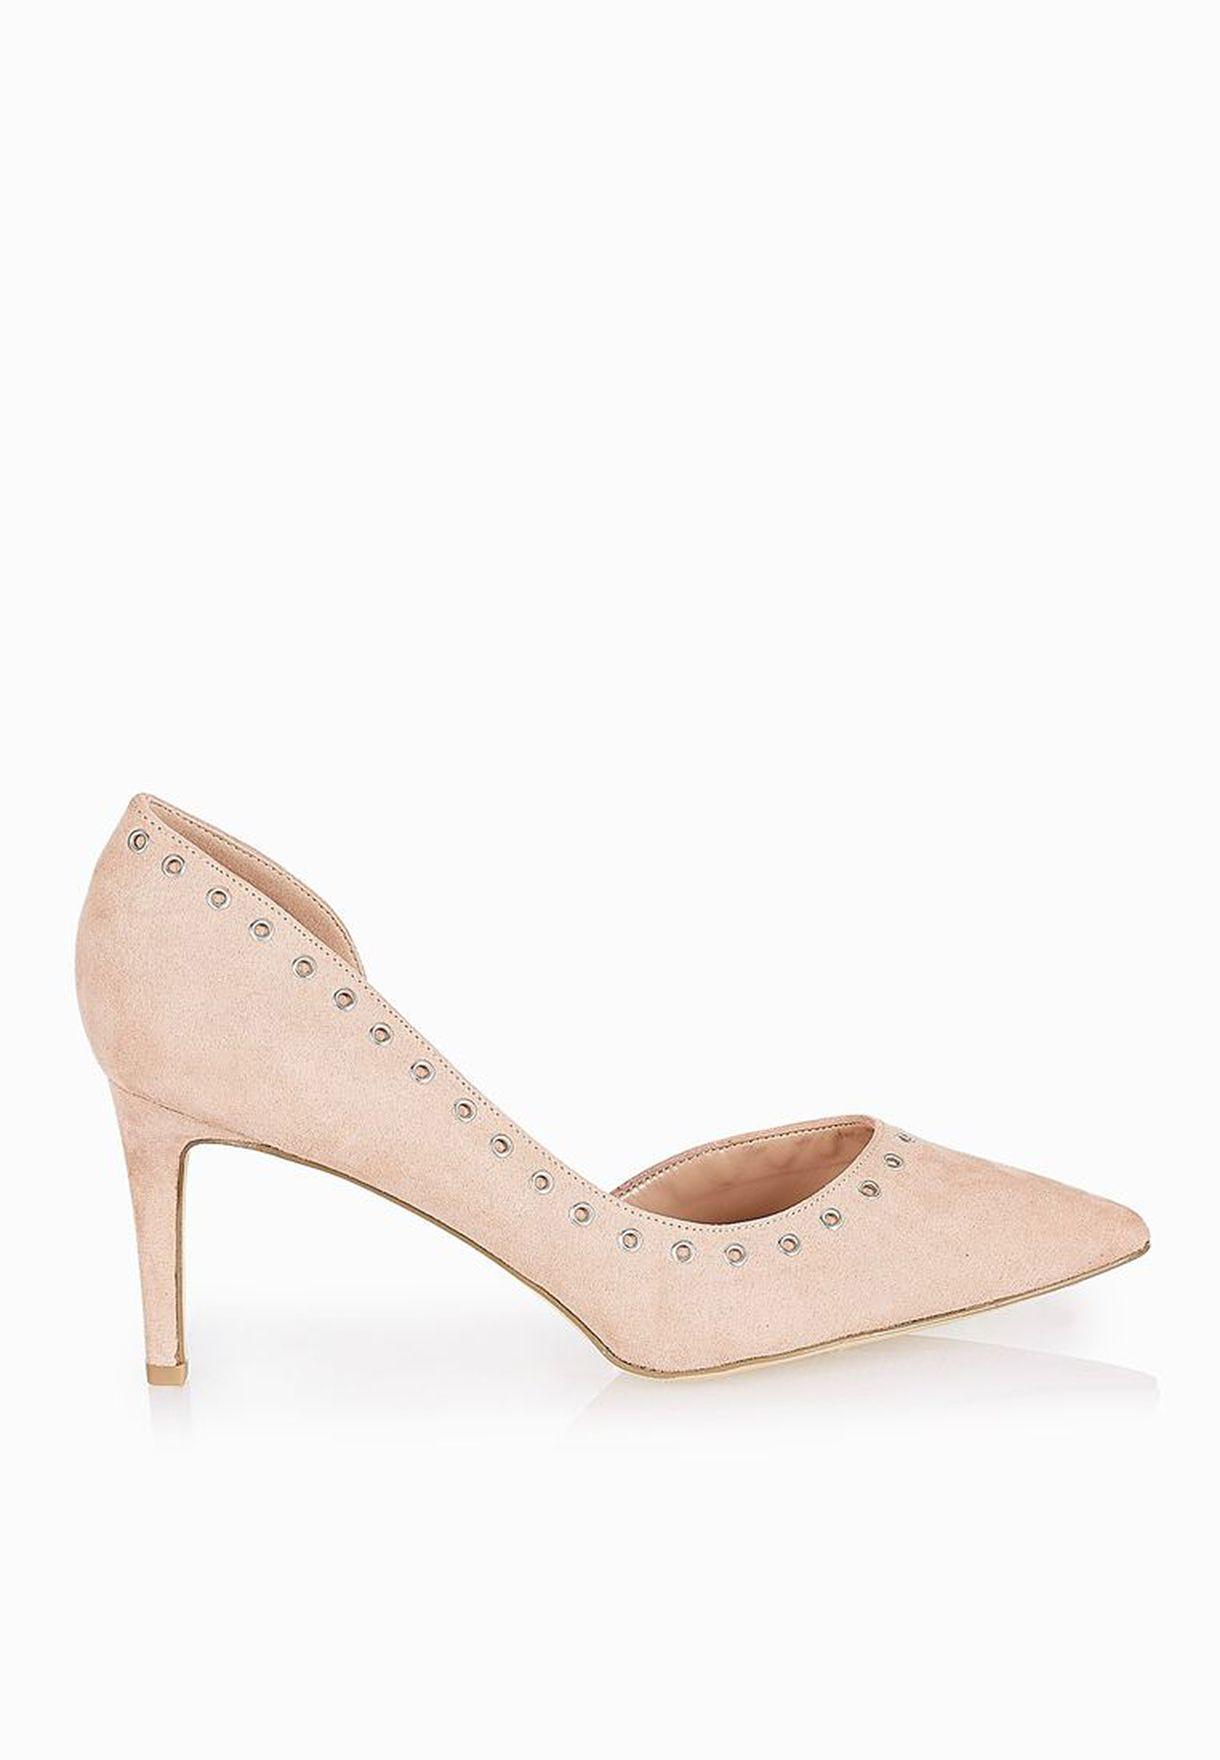 caff9cf51 تسوق حذاء بمقدمة مدببة ماركة نيو لوك لون ألوان محايدة في البحرين ...